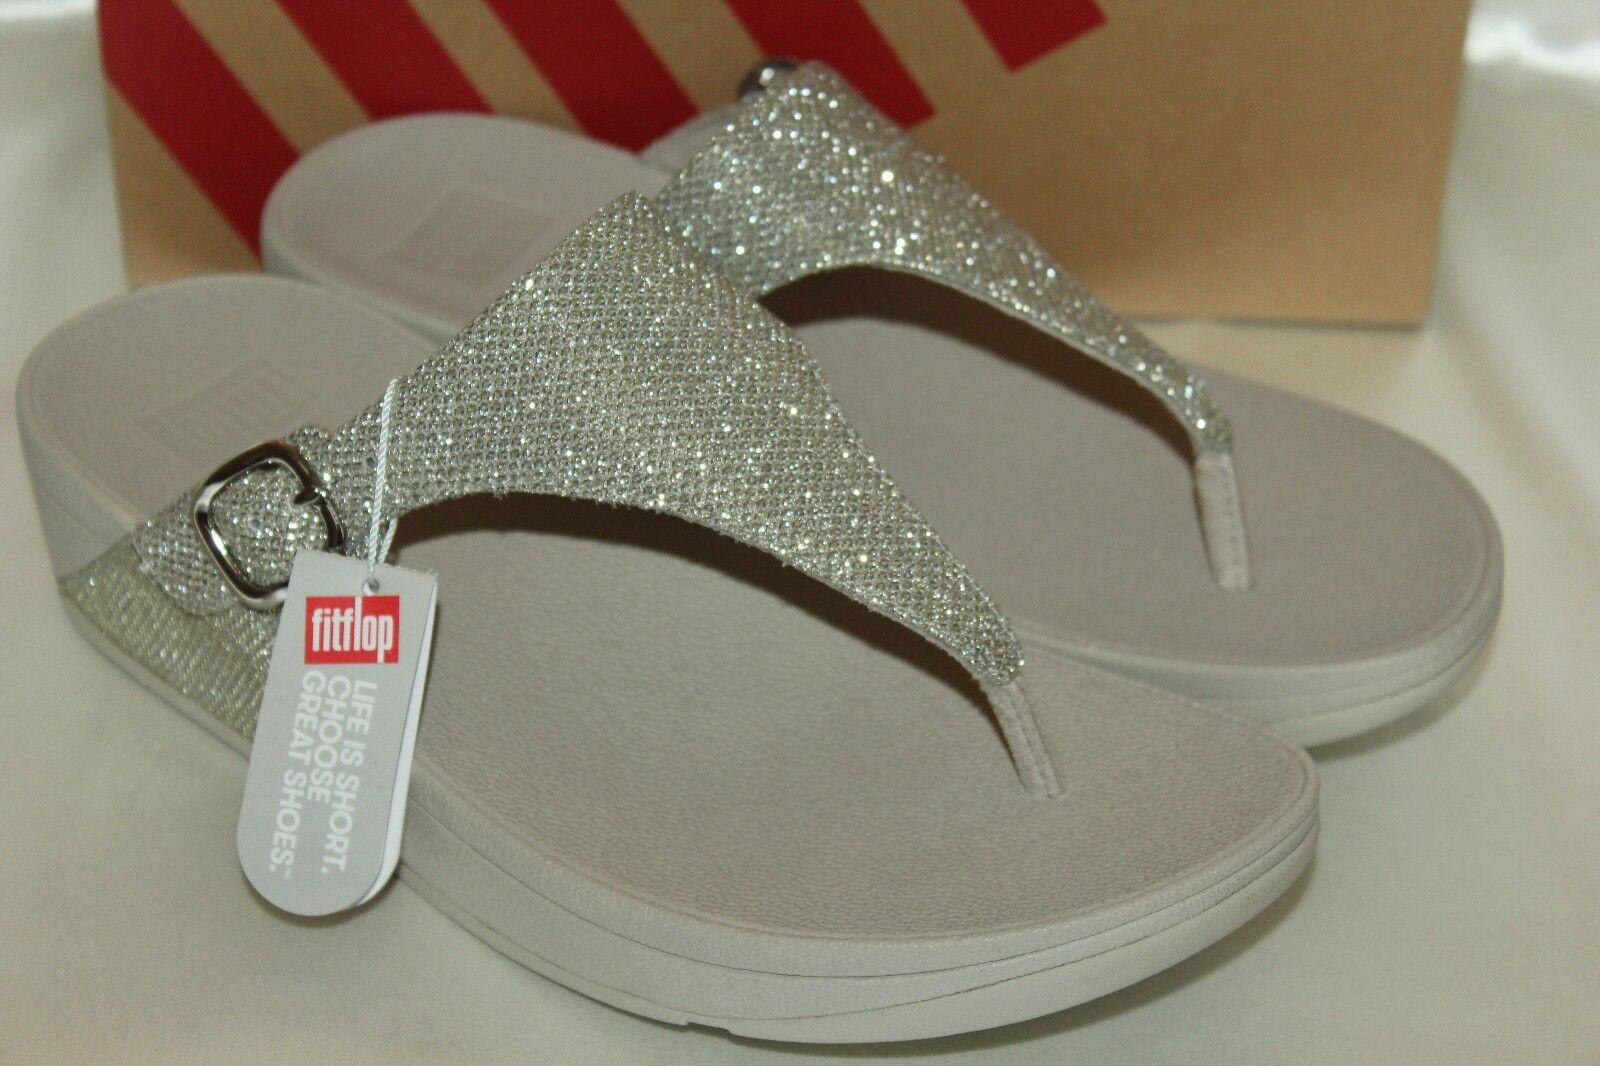 NEU NIB FITFLOP Pale Gold THE SKINNY SPARKLE Flip Flop Thong Slide Sandales Sz 9